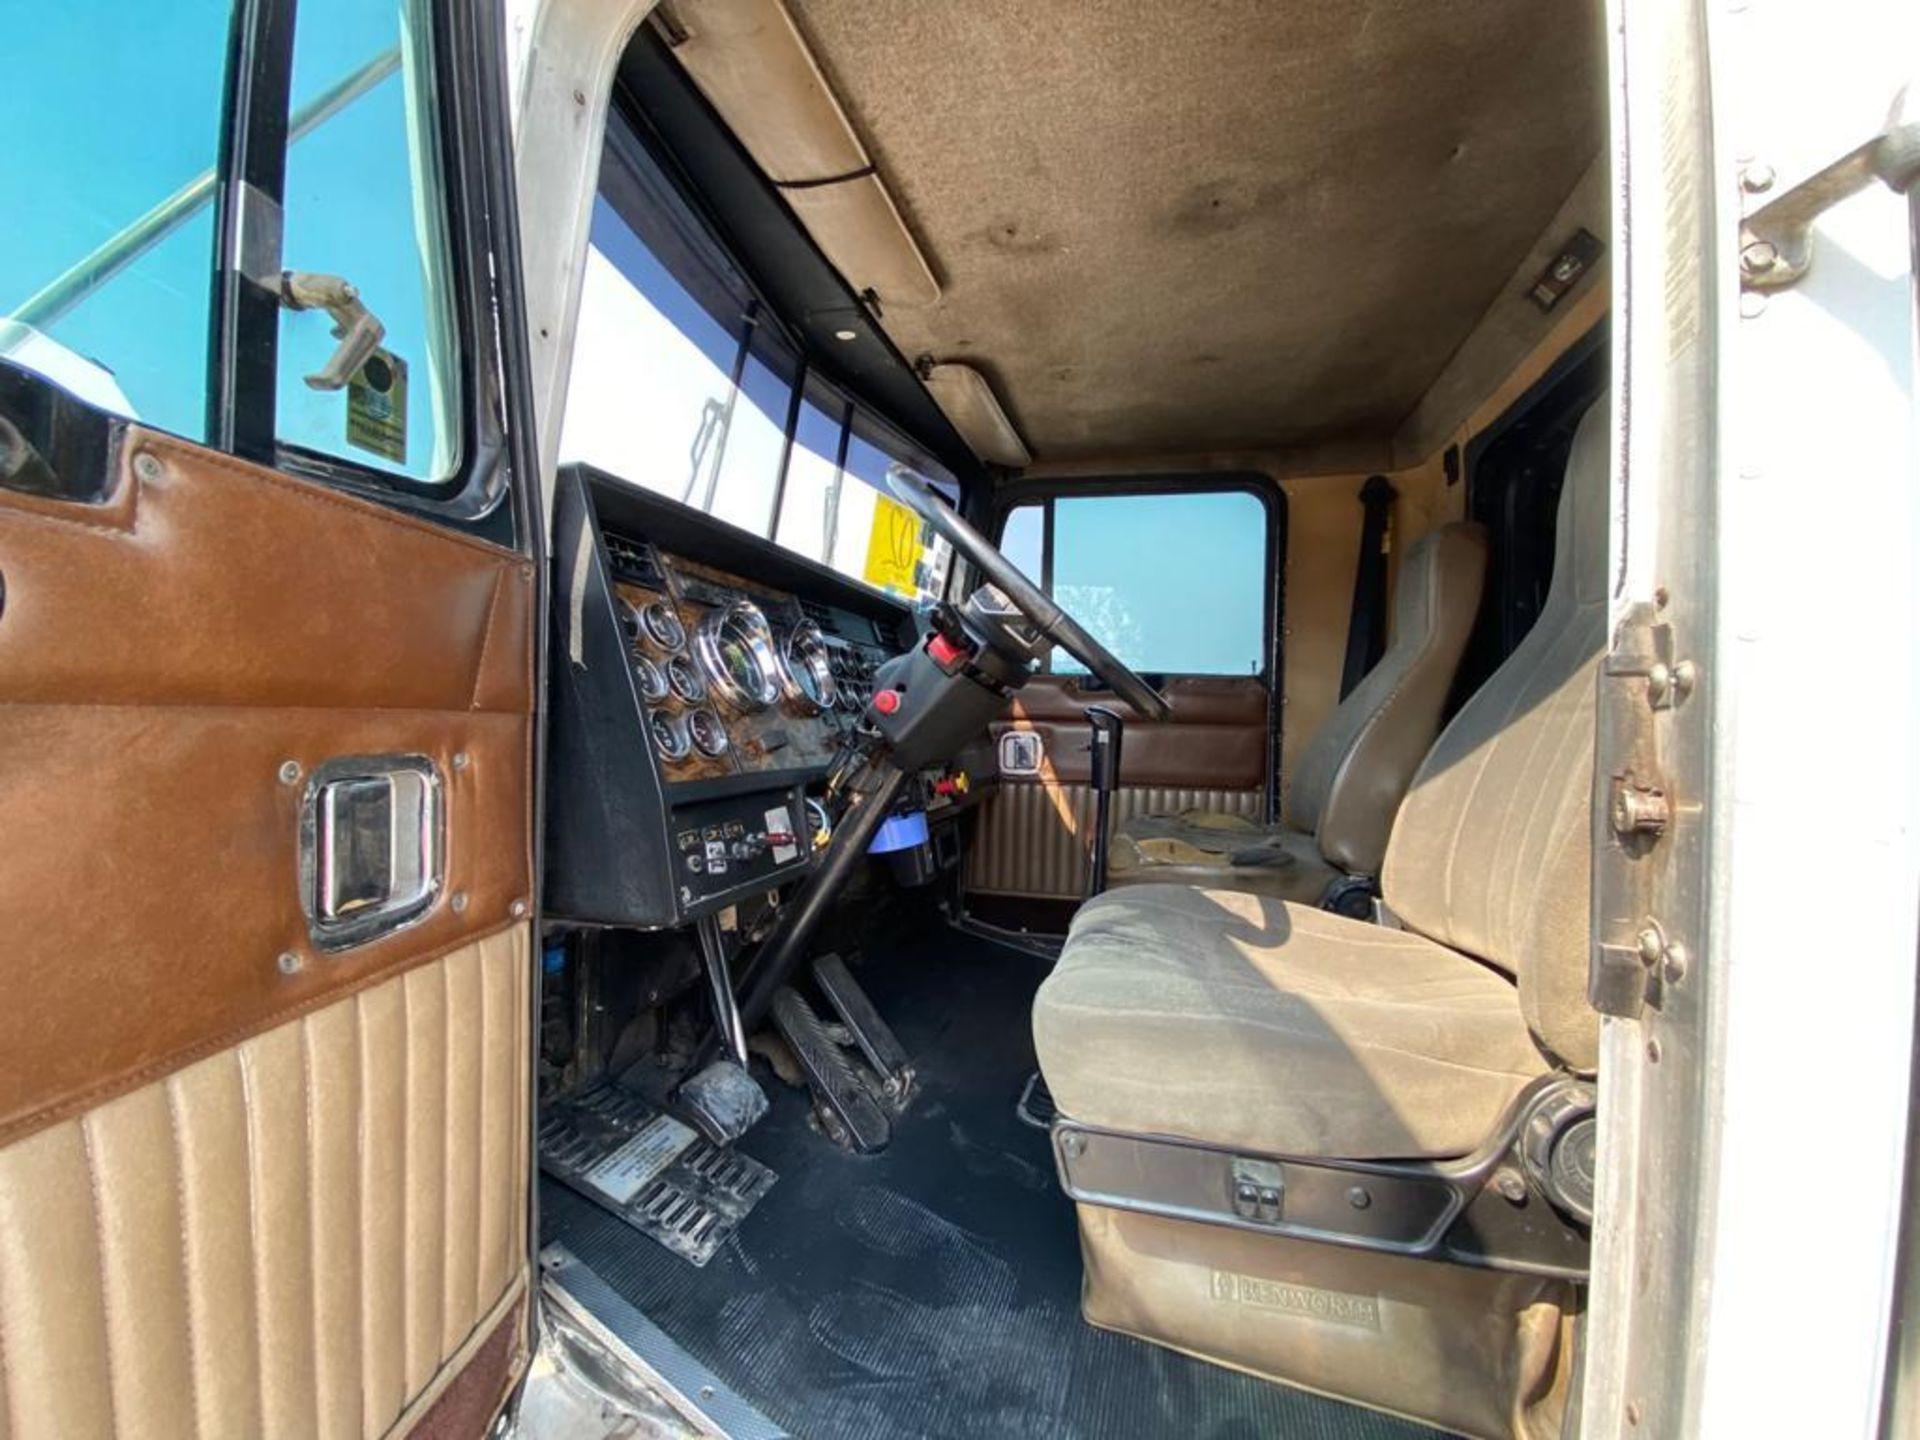 1999 Kenworth Sleeper truck tractor, standard transmission of 18 speeds - Image 50 of 75